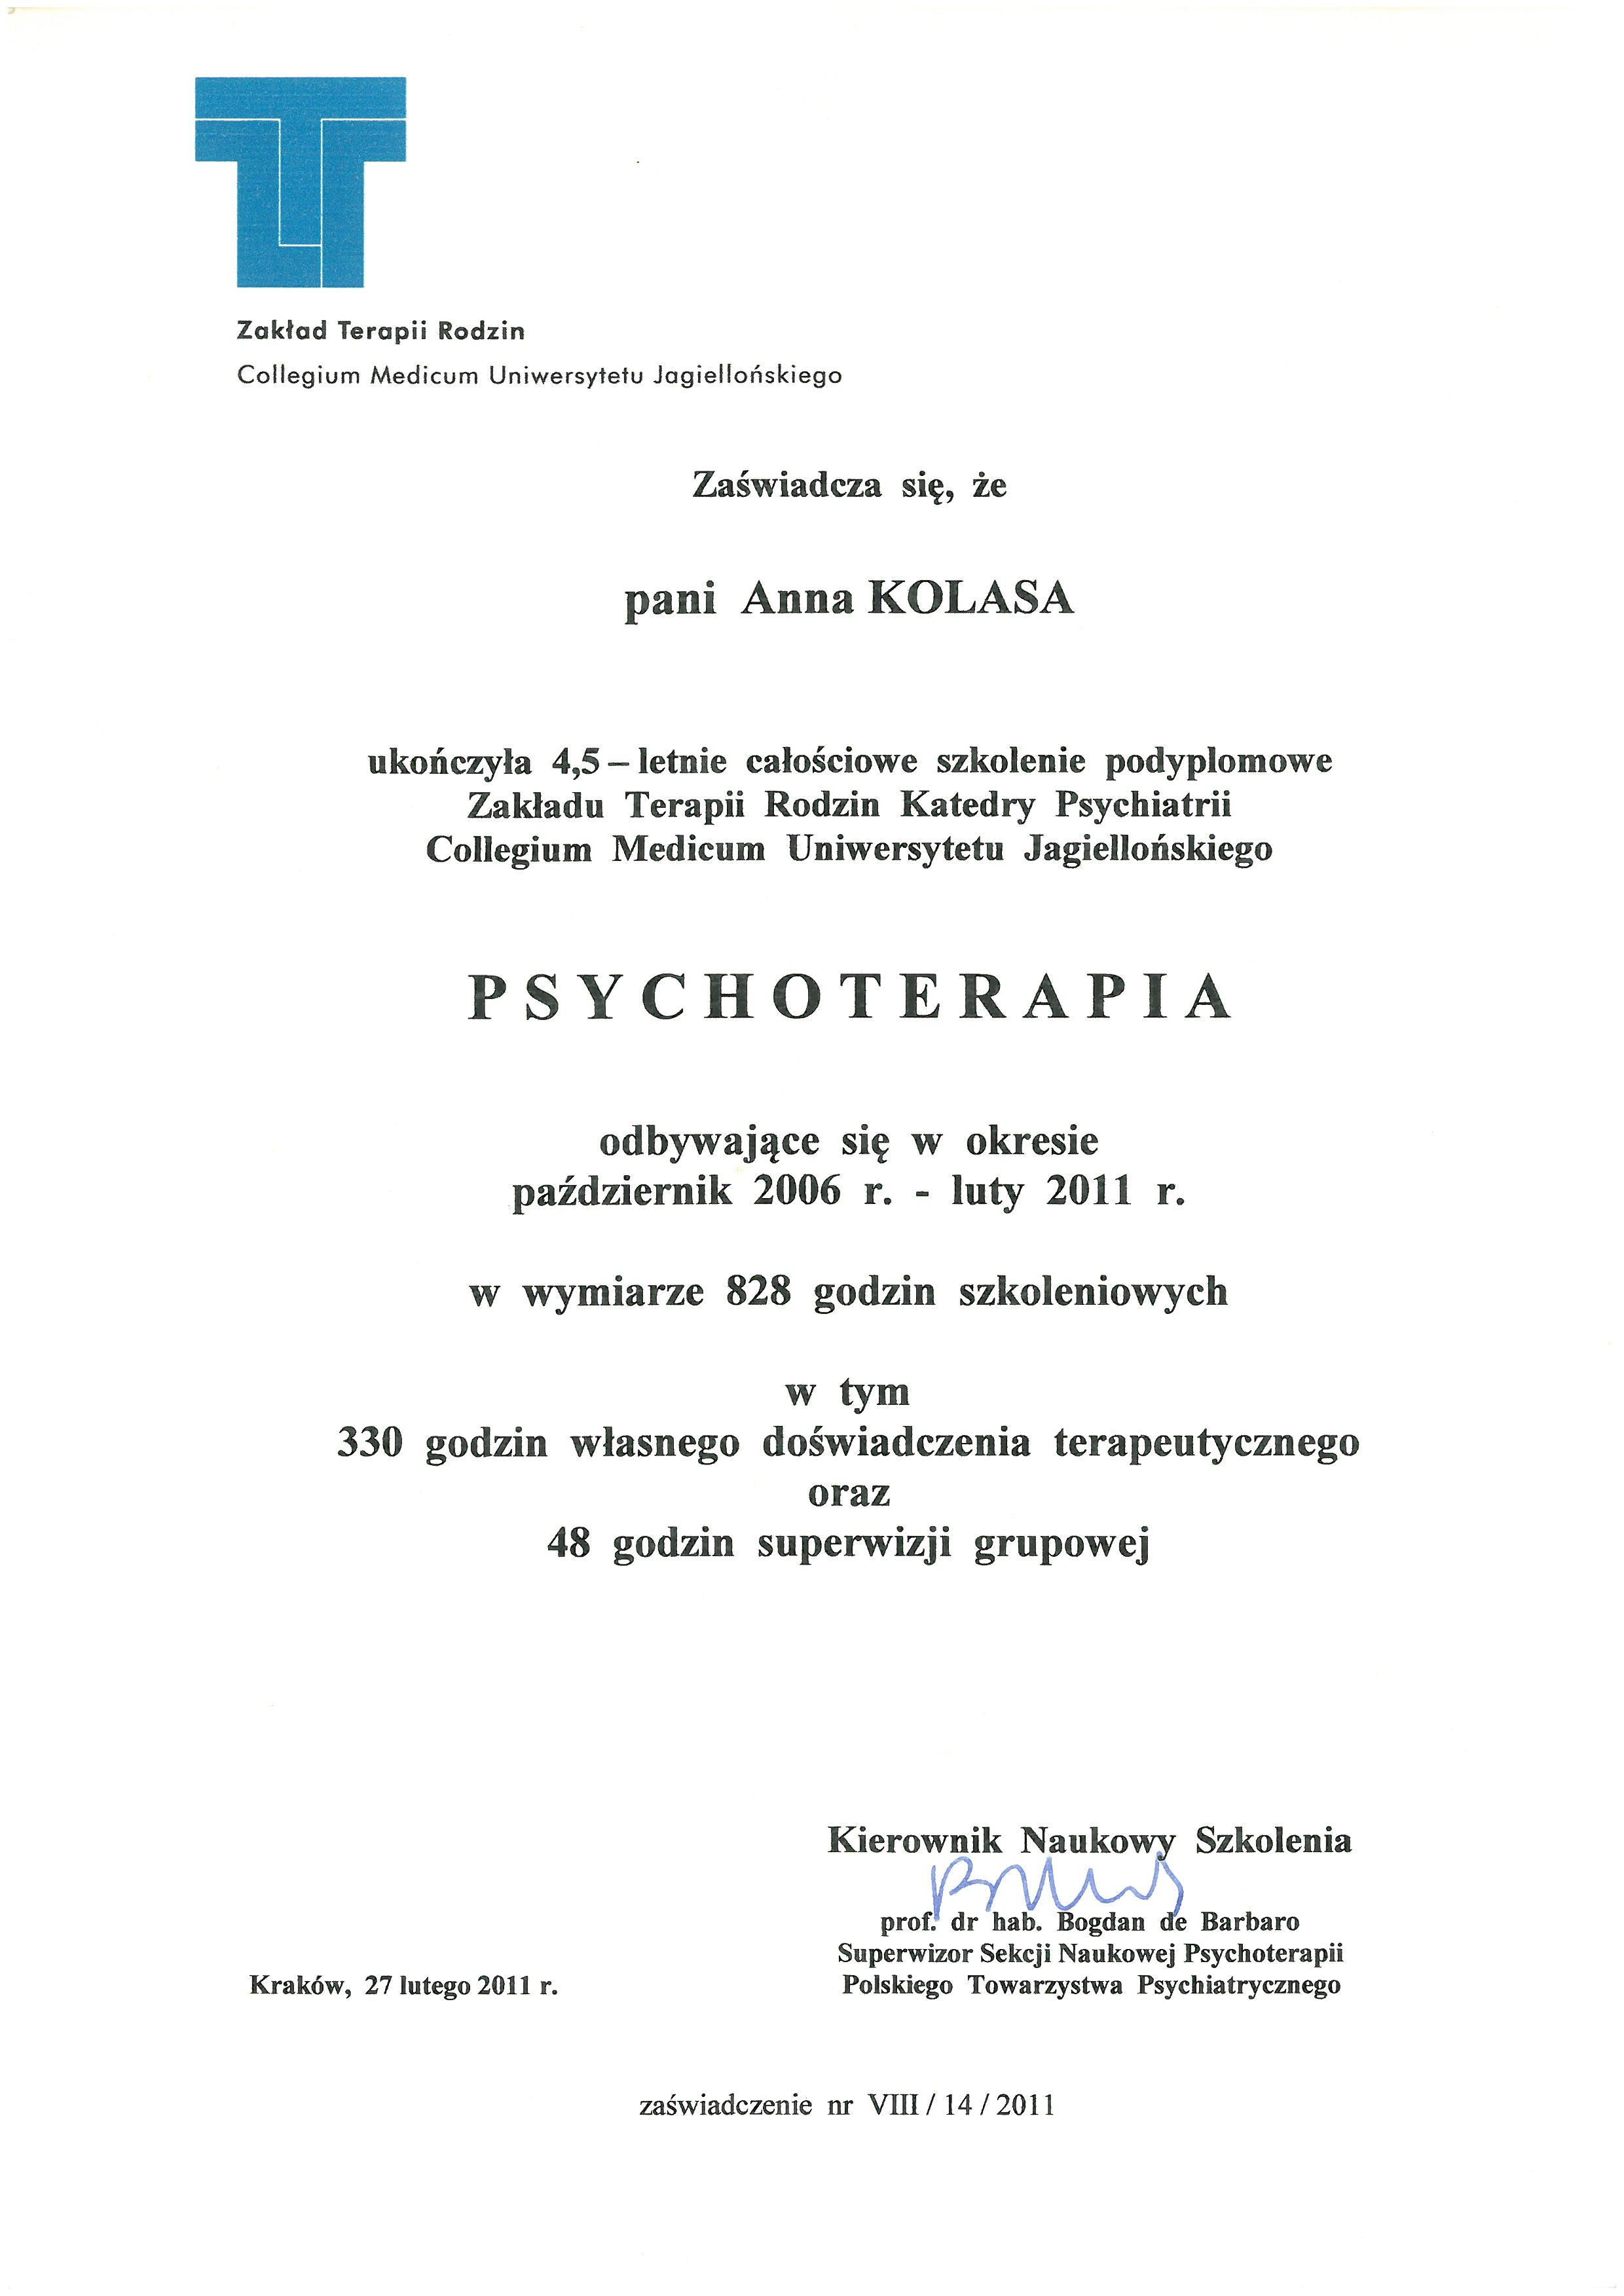 Psychoterpia #1a